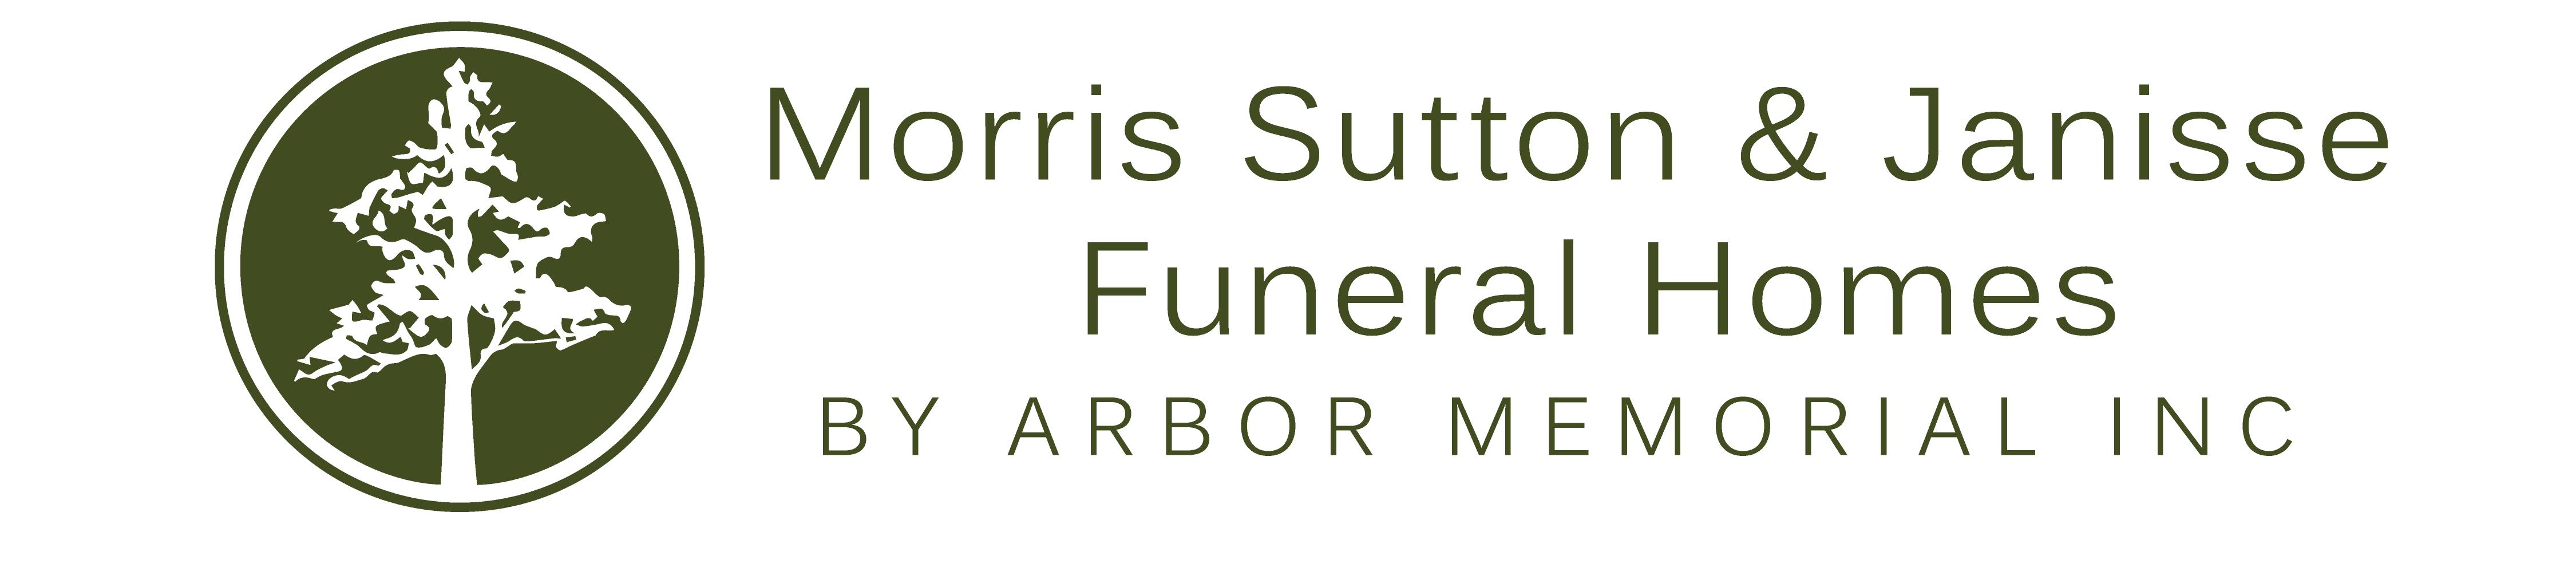 Morris Sutton & Janisse Funeral Homes Logo